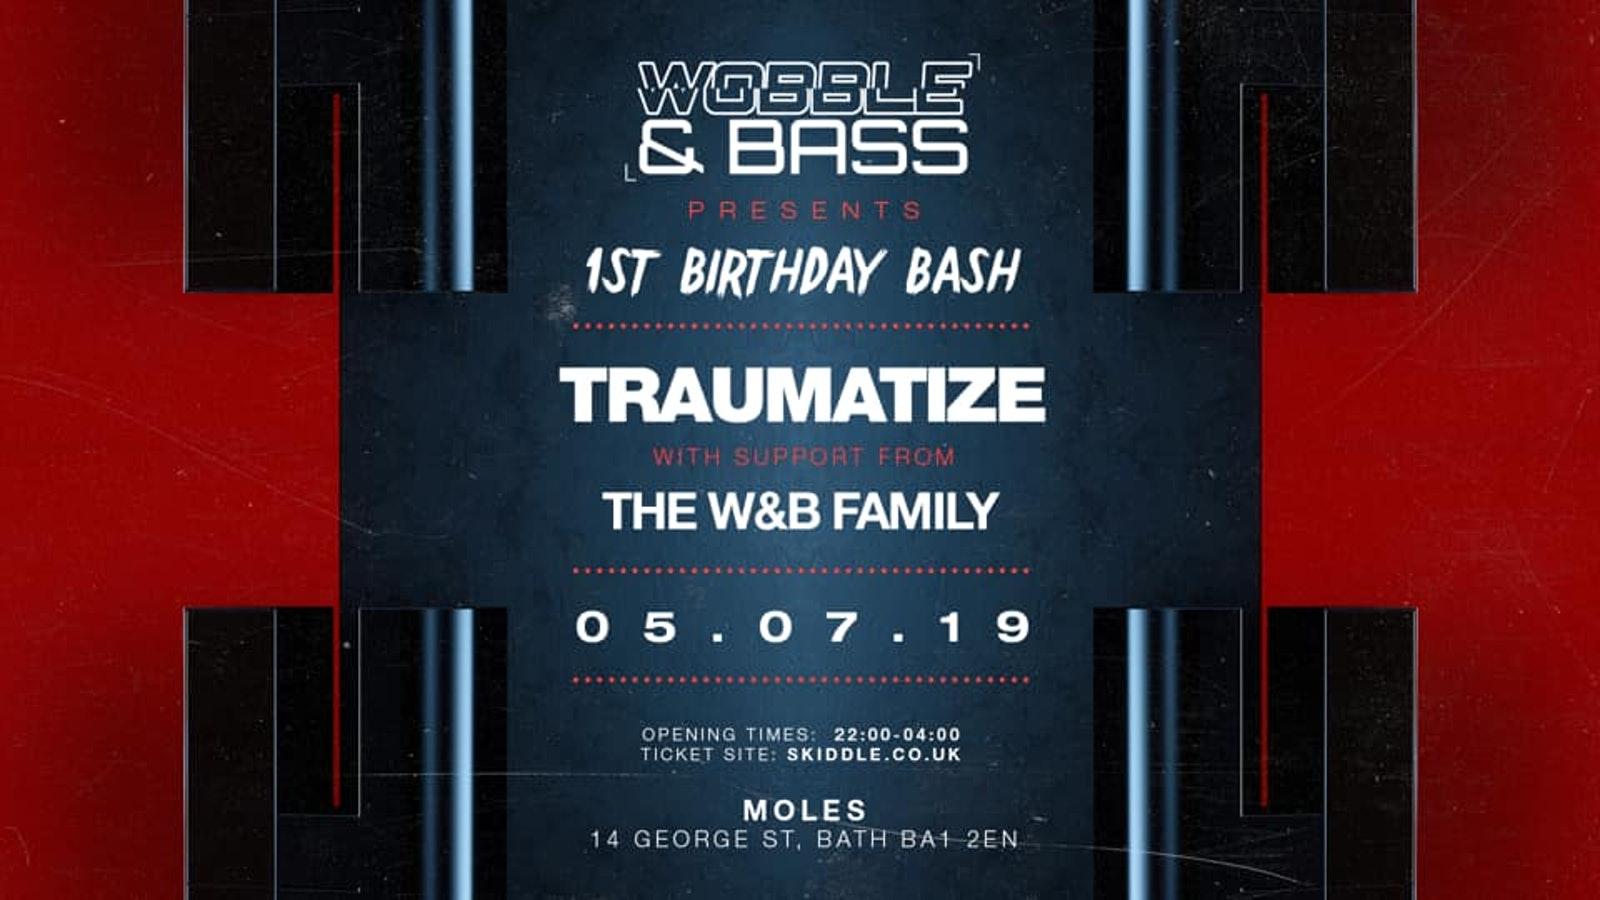 Wobble&Bass: 1st Birthday Bash ft. TRAUMATIZE